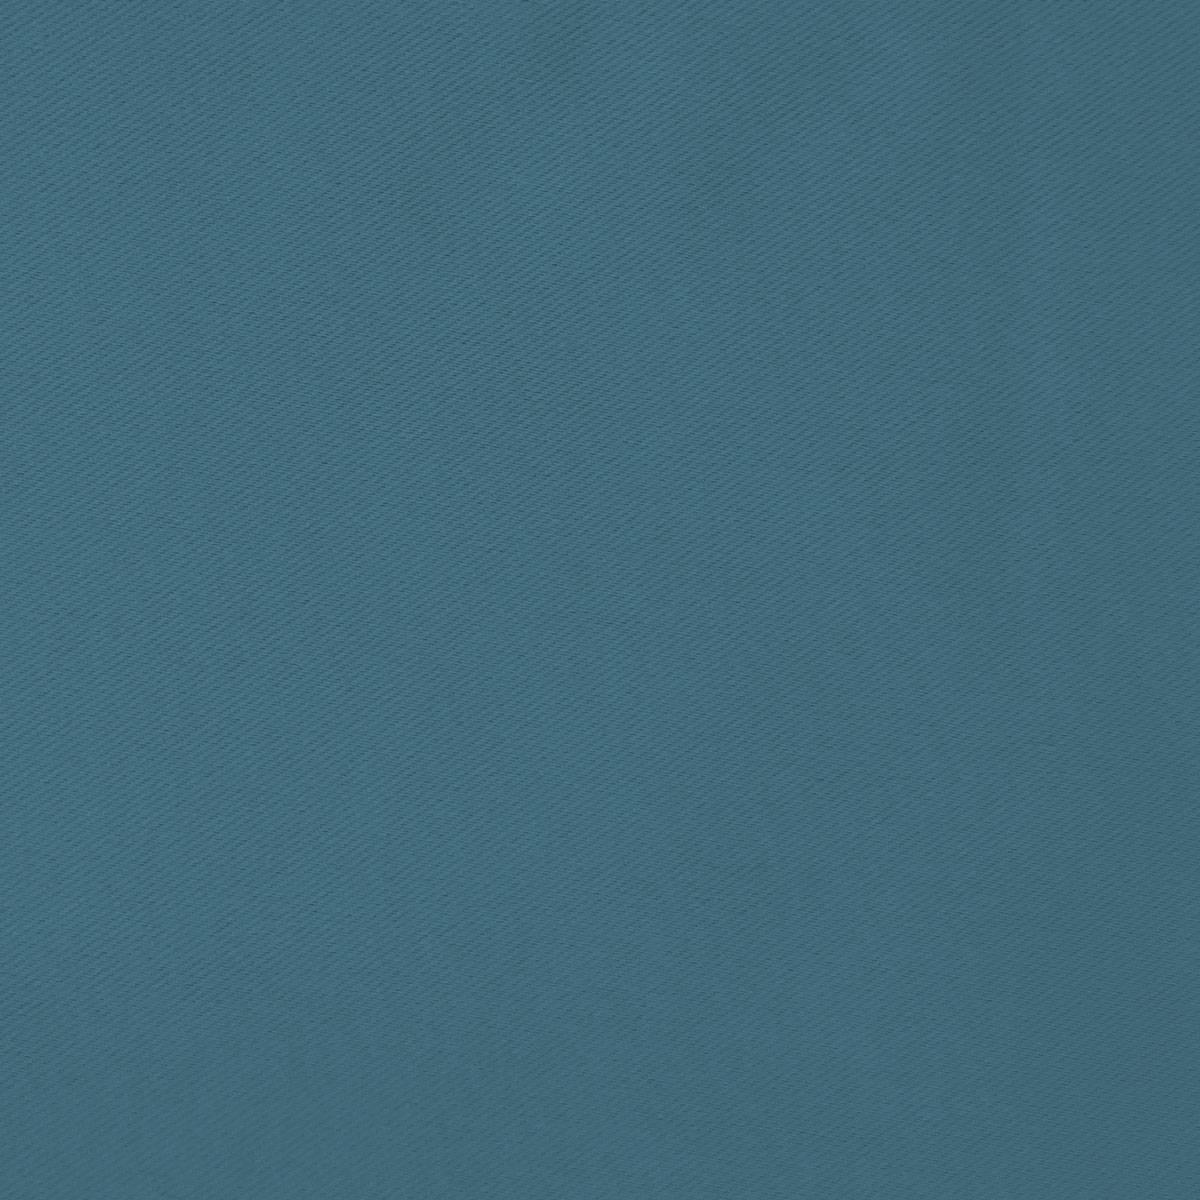 Dimmout blickdichter Vorhang LONDON [Verdunkelungs Vorhang